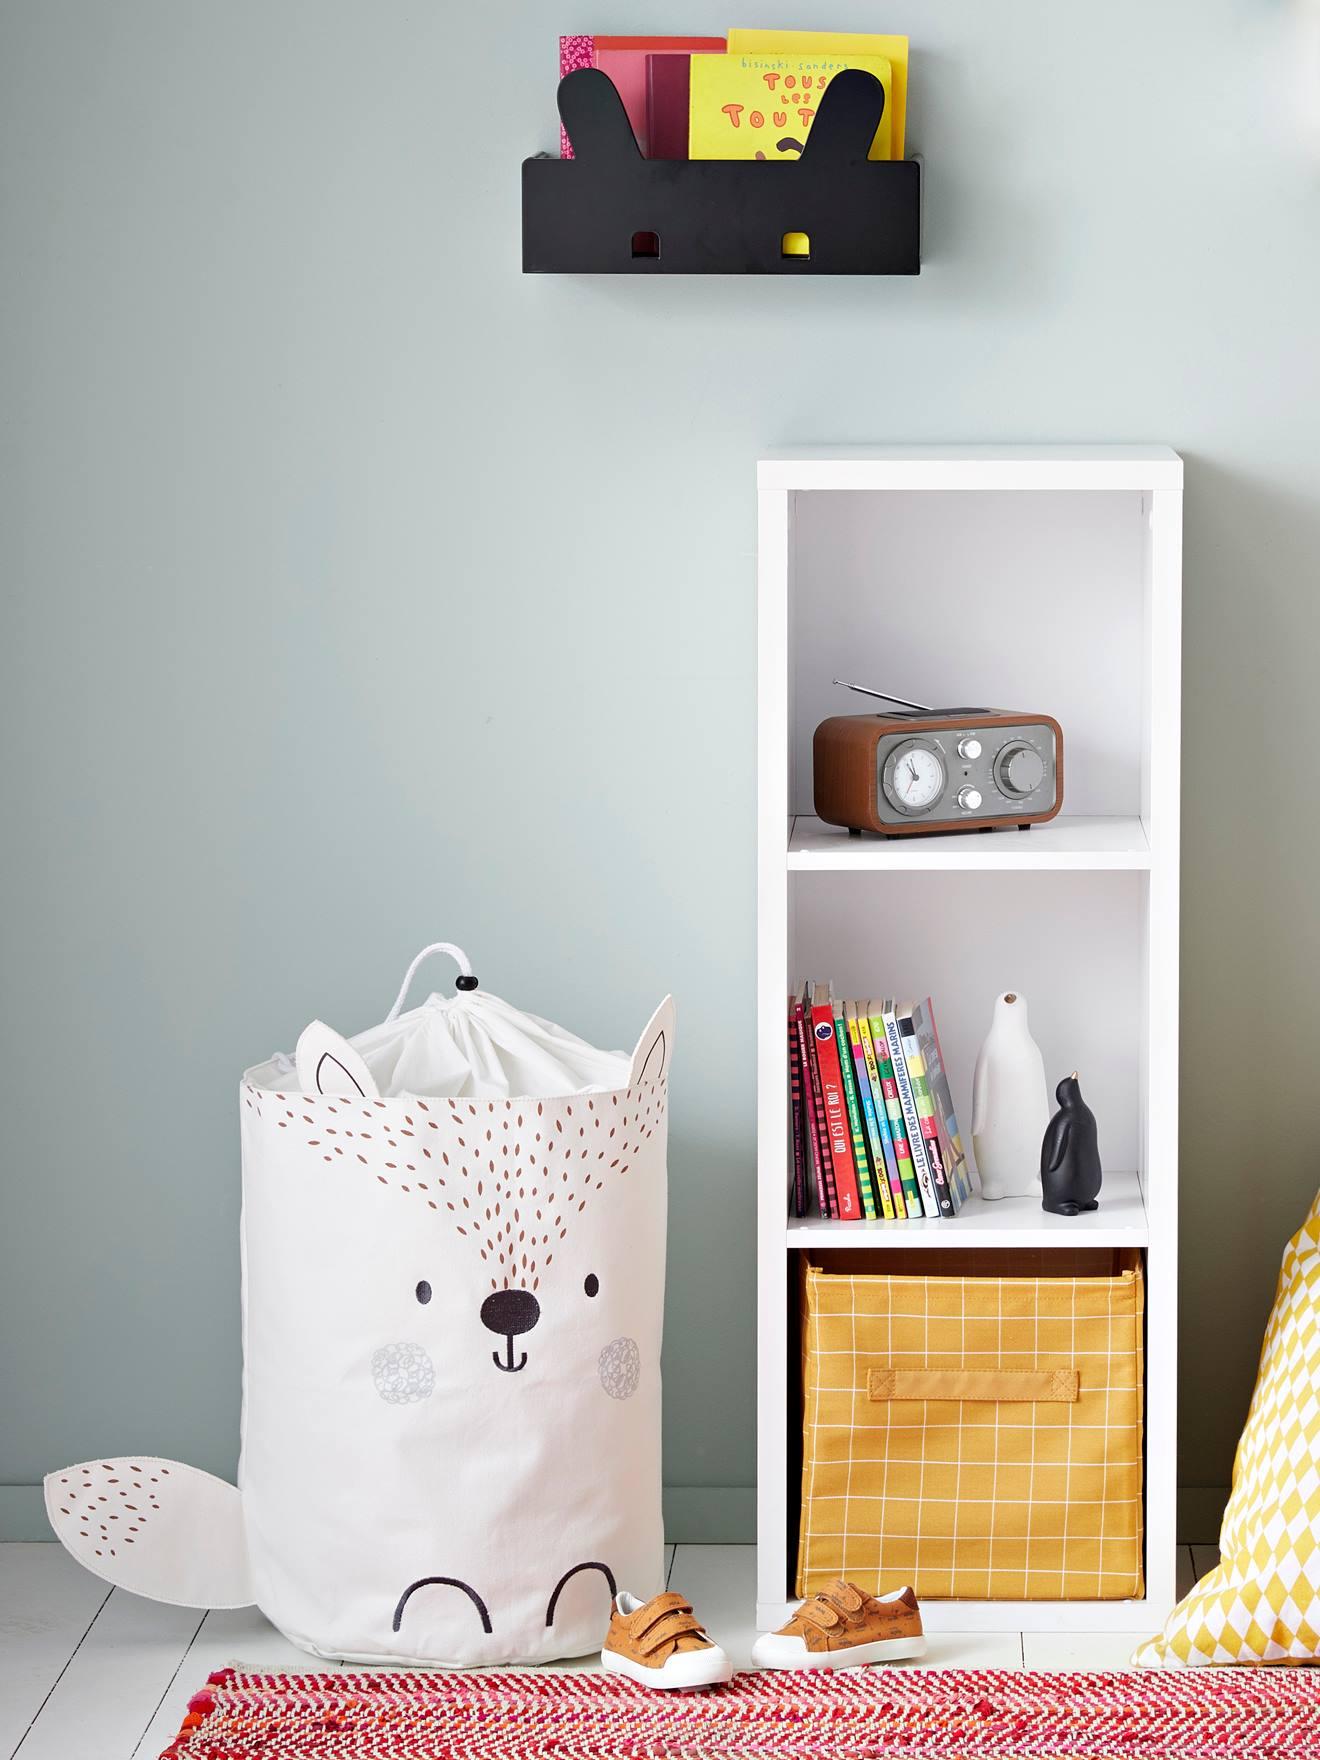 Full Size of Wäschekorb Kinderzimmer Vertbaudet Wschekorb Regal Regale Weiß Sofa Kinderzimmer Wäschekorb Kinderzimmer